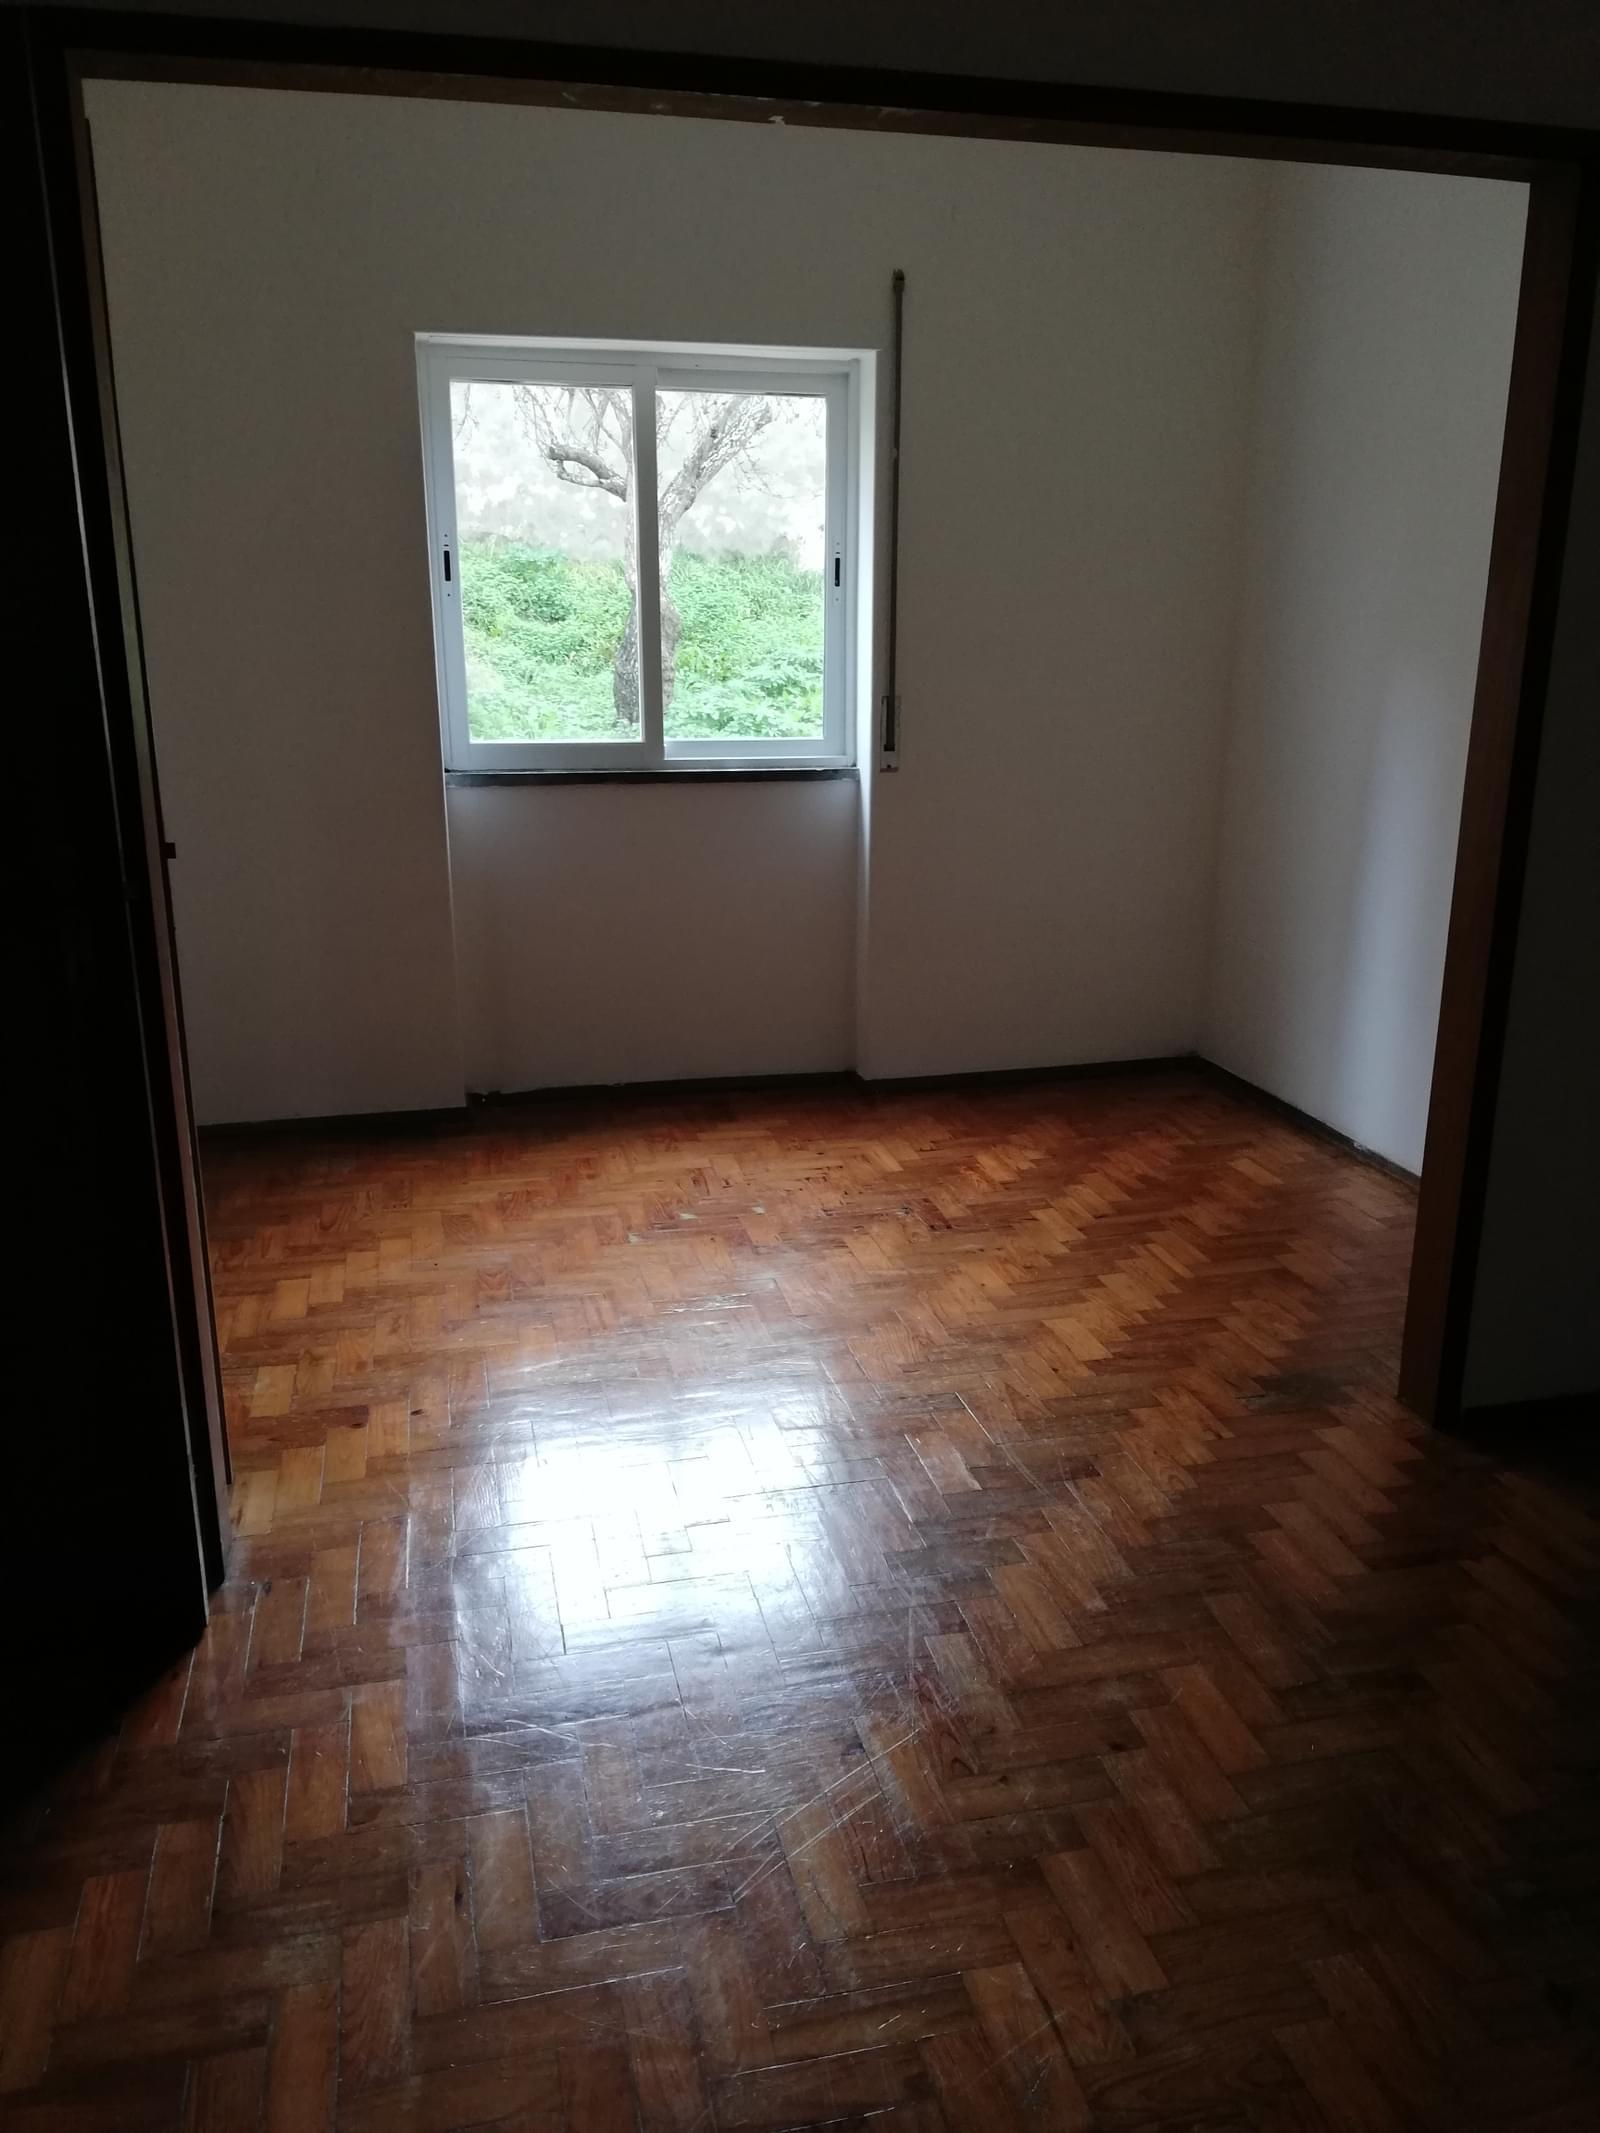 pf19207-apartamento-t2-cascais-872a8d80-26f6-4b5f-b1bc-9bc4cfc7167f